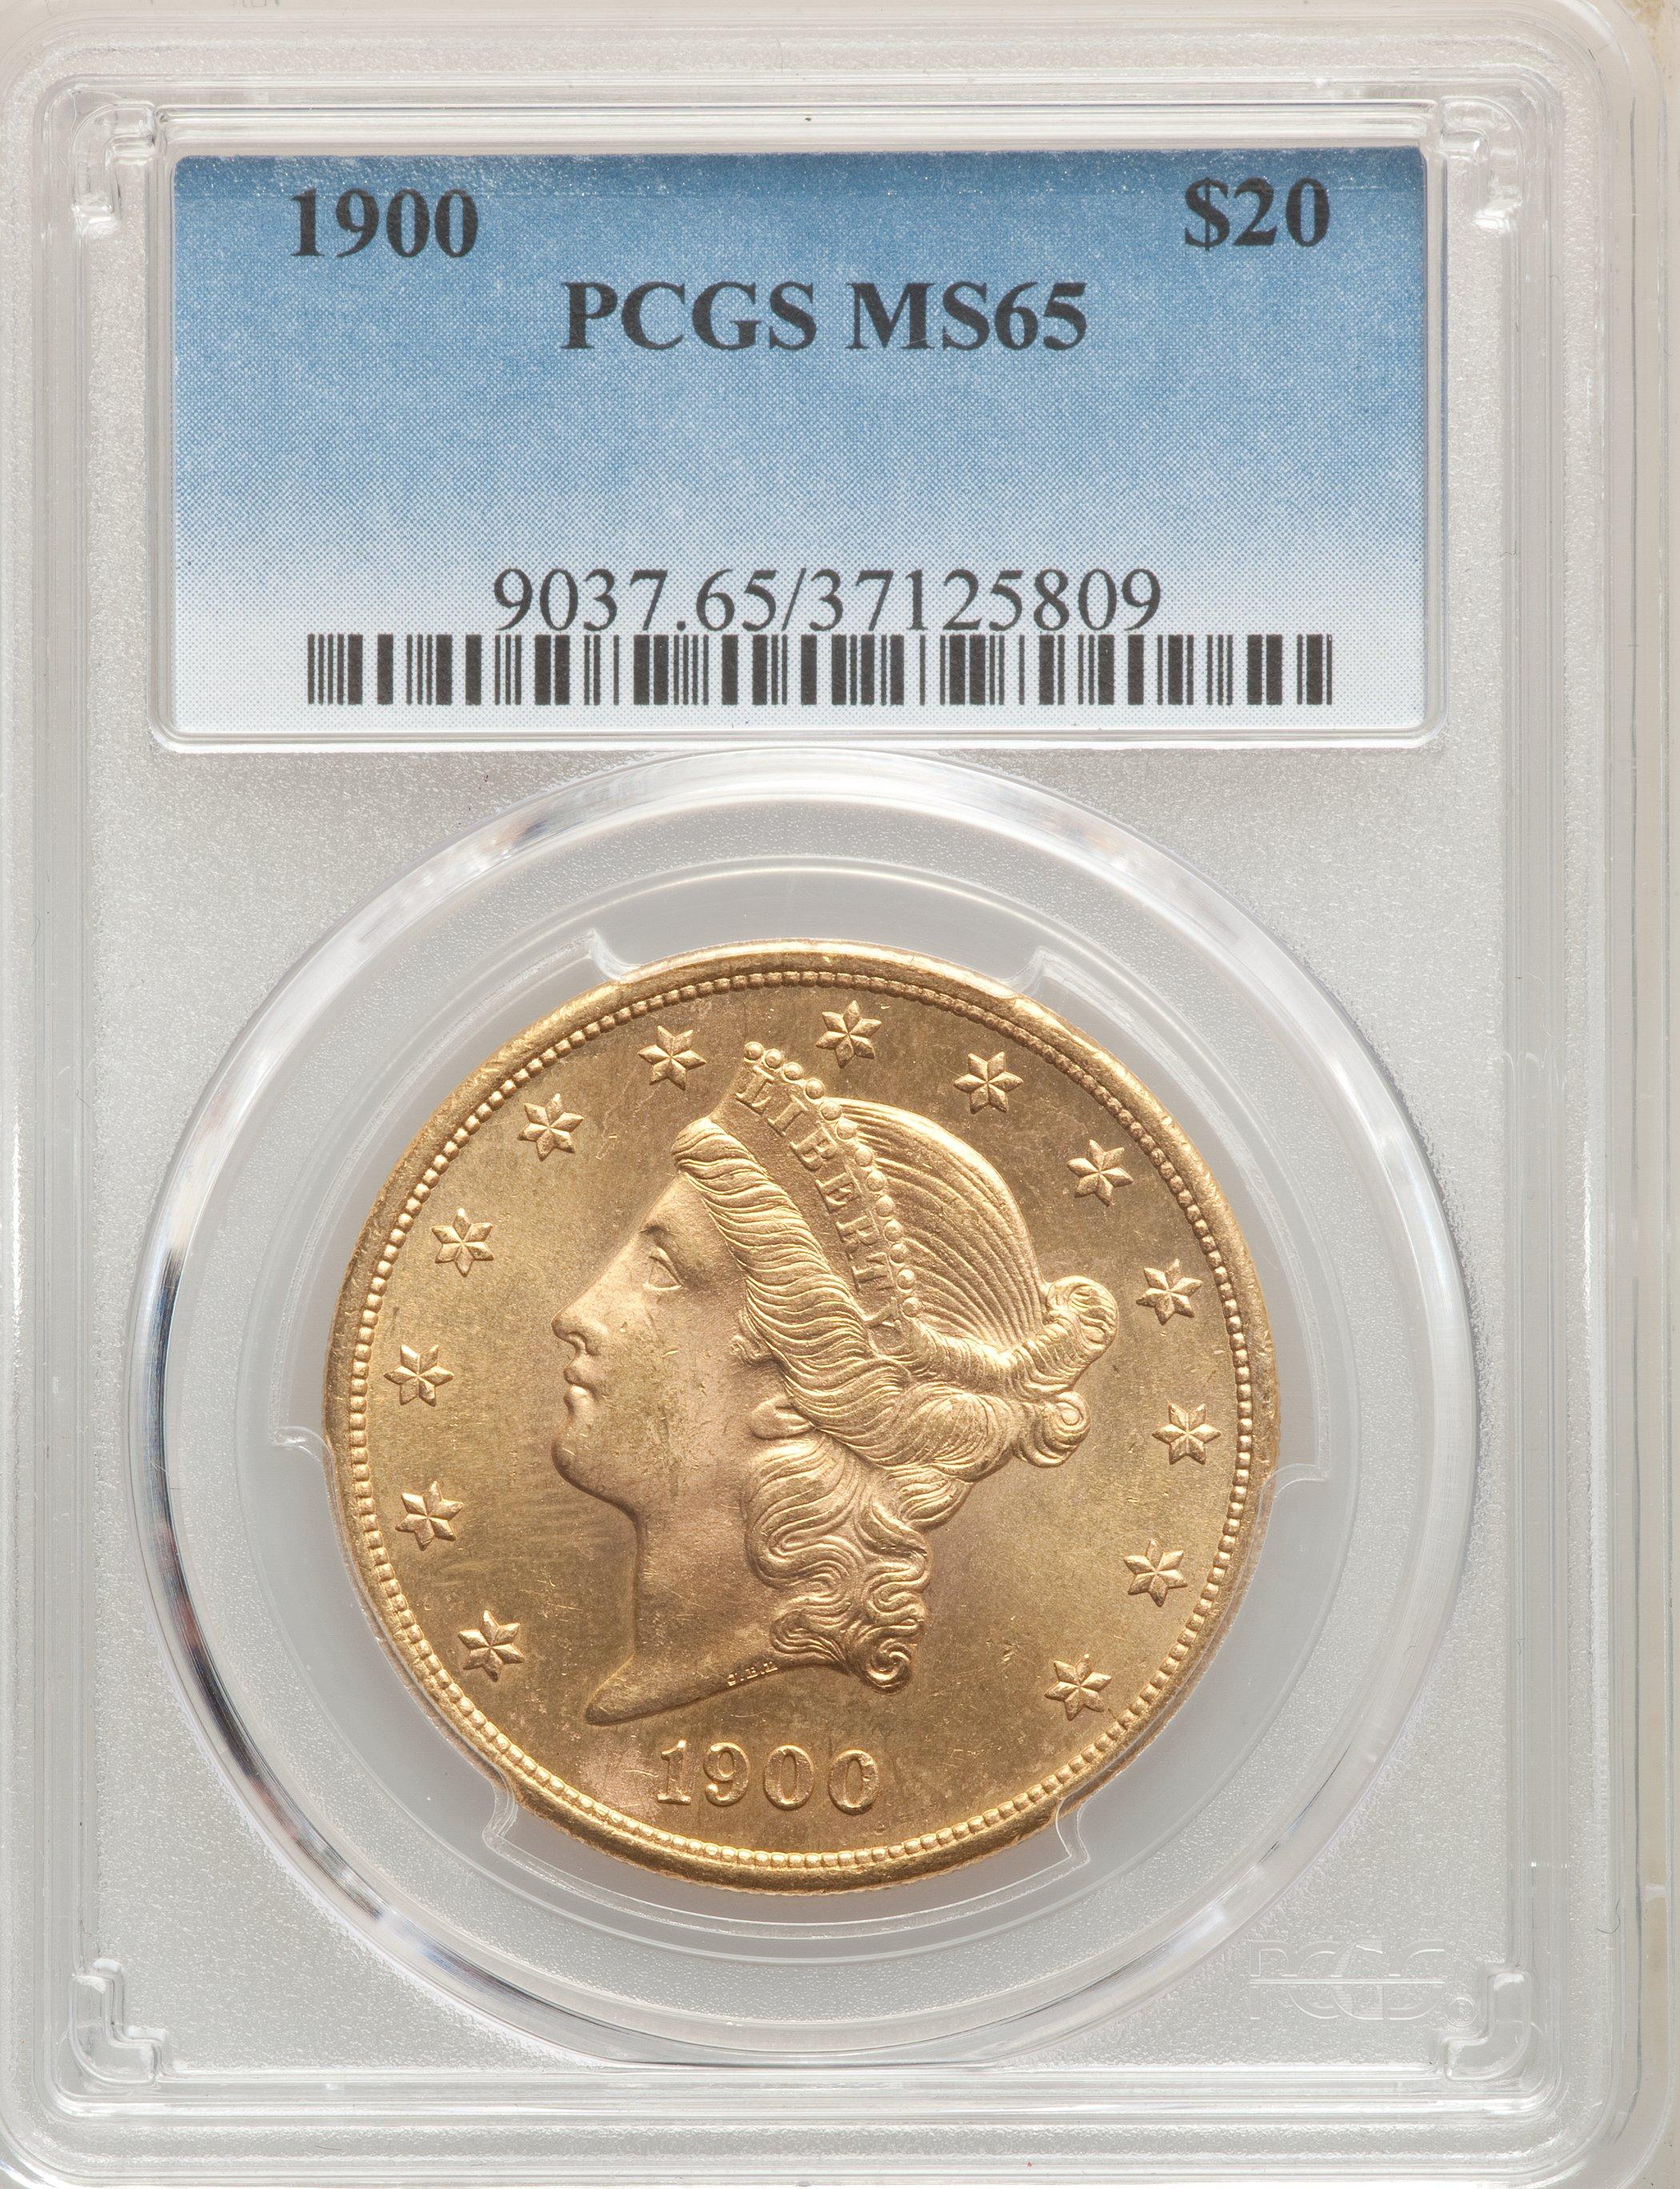 PCGS MS65 US Gold $20 Liberty Head Double Eagle Random Date